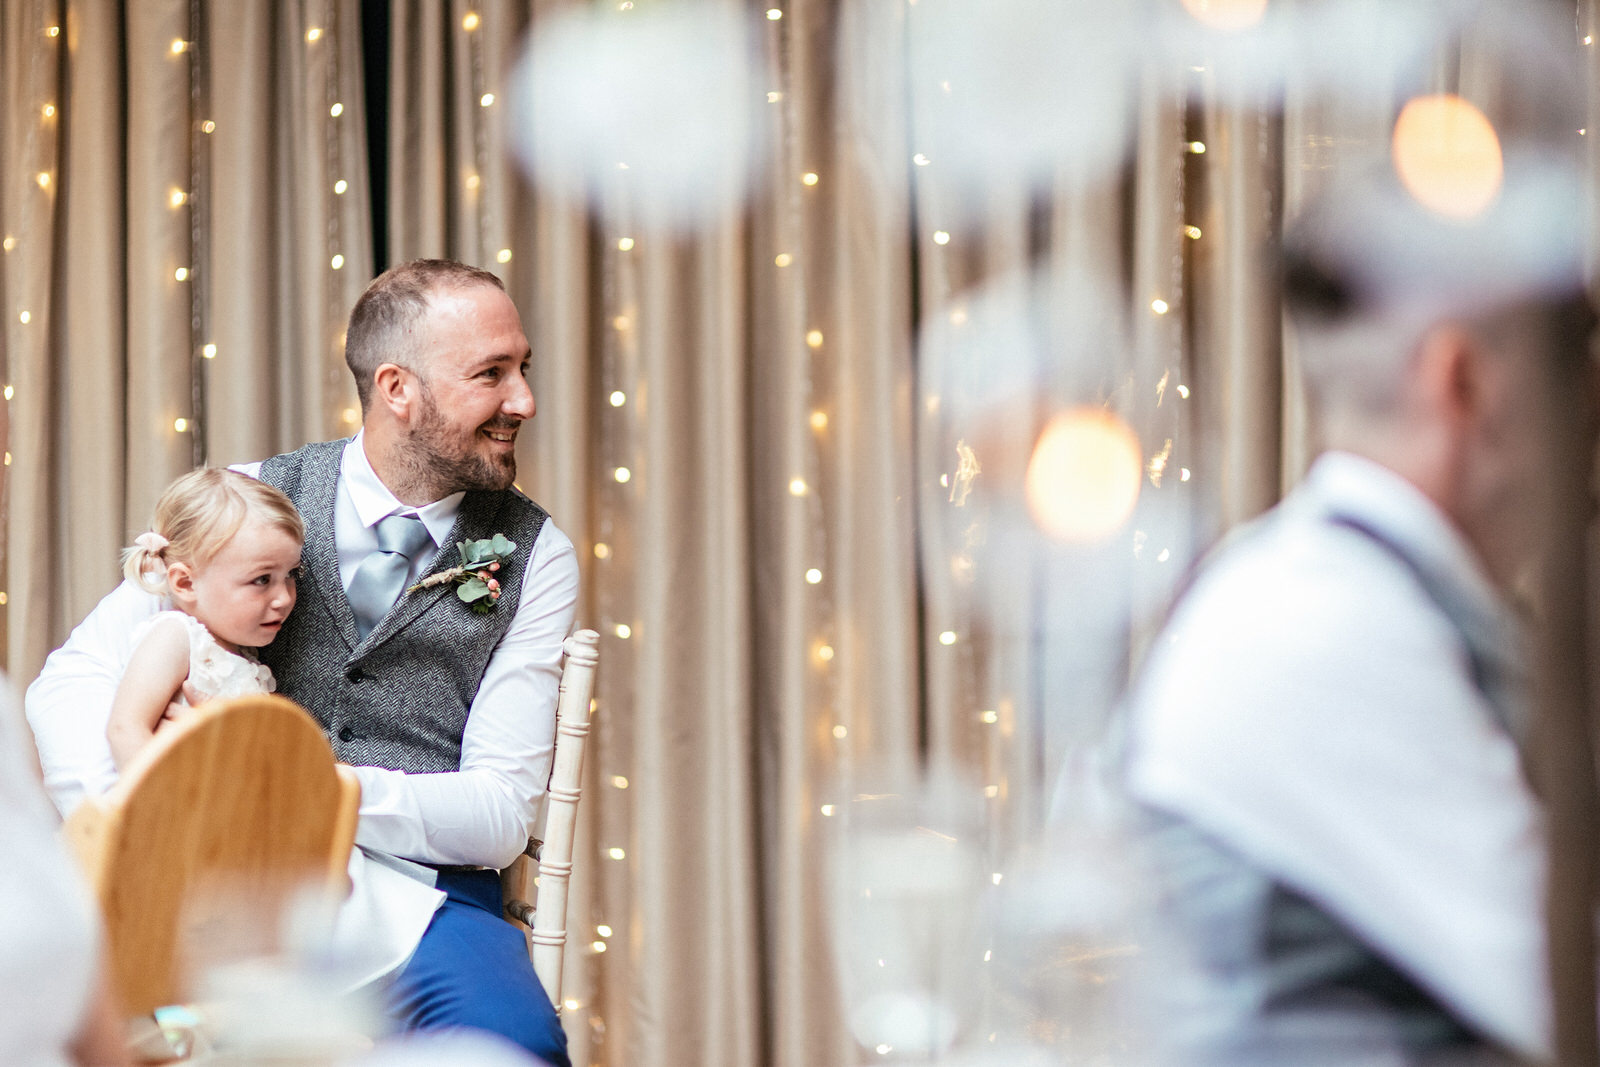 Moddershall-Oaks-Spa-Wedding-Photographer-054.jpg